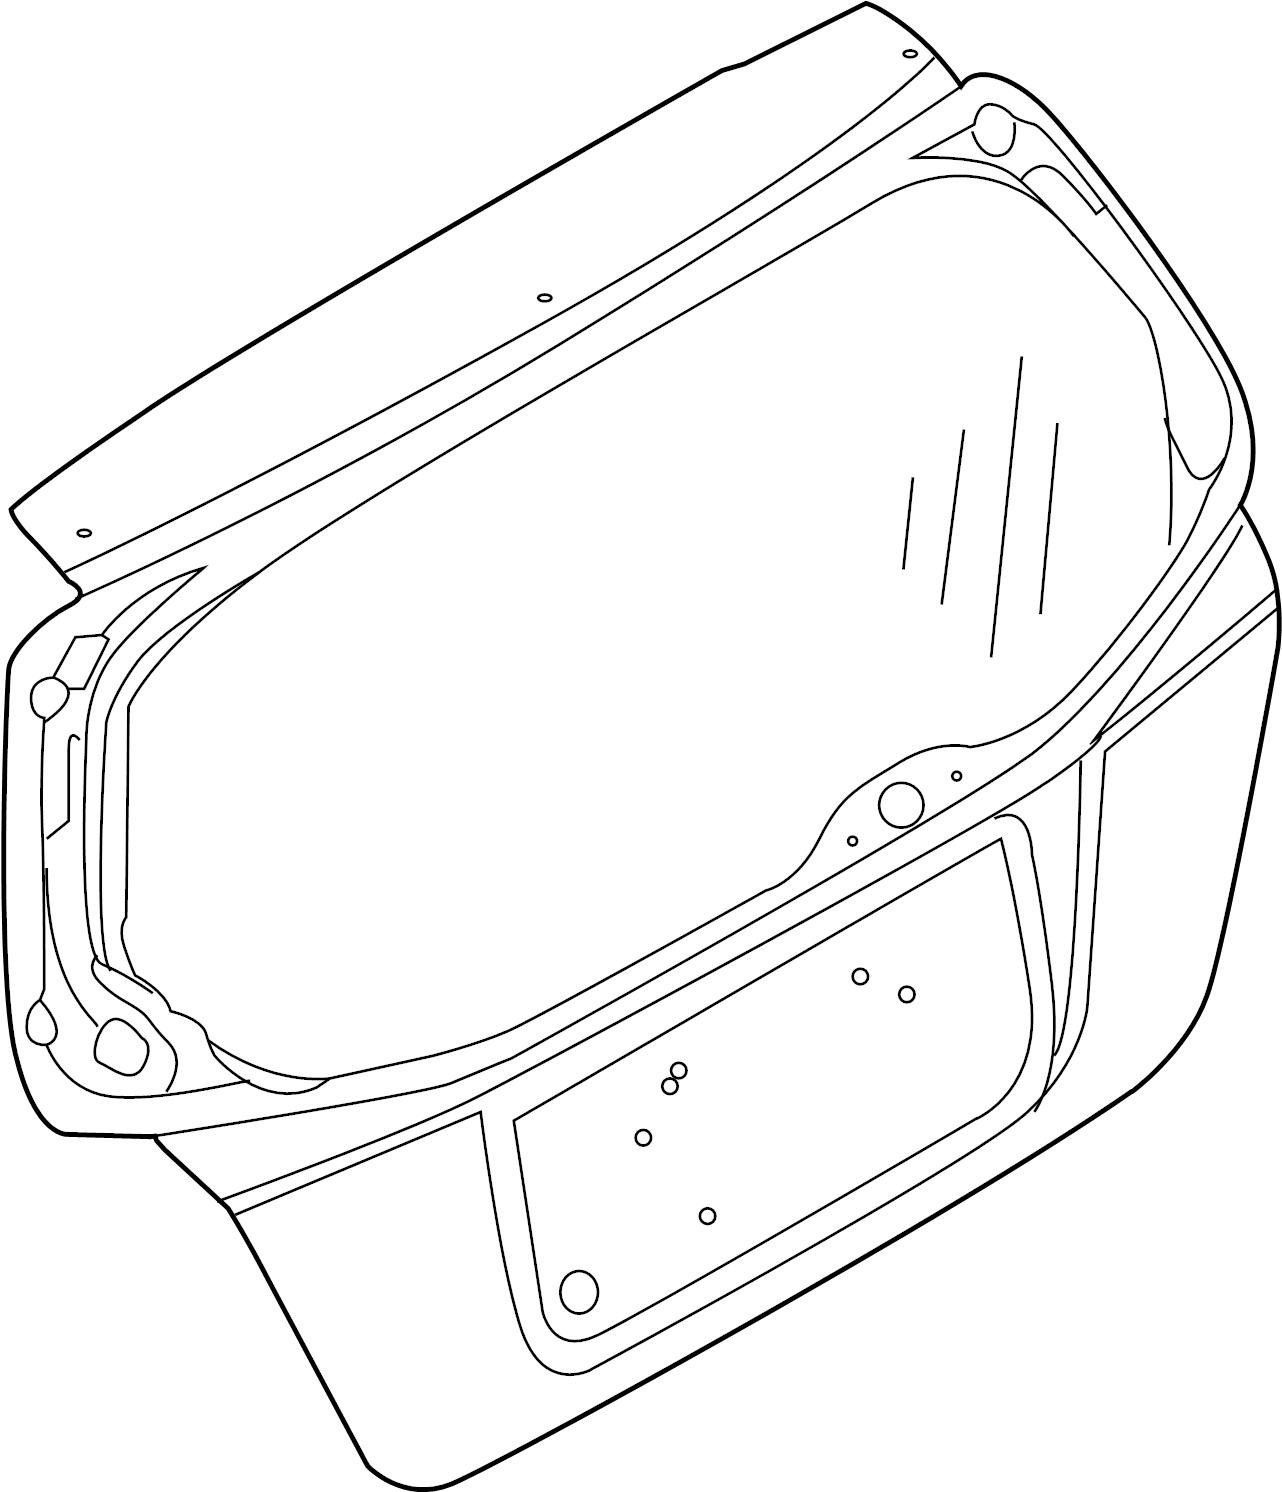 2001 Mercury Villager Fuse Box Diagram Auto Electrical Wiring Blower Motor 96